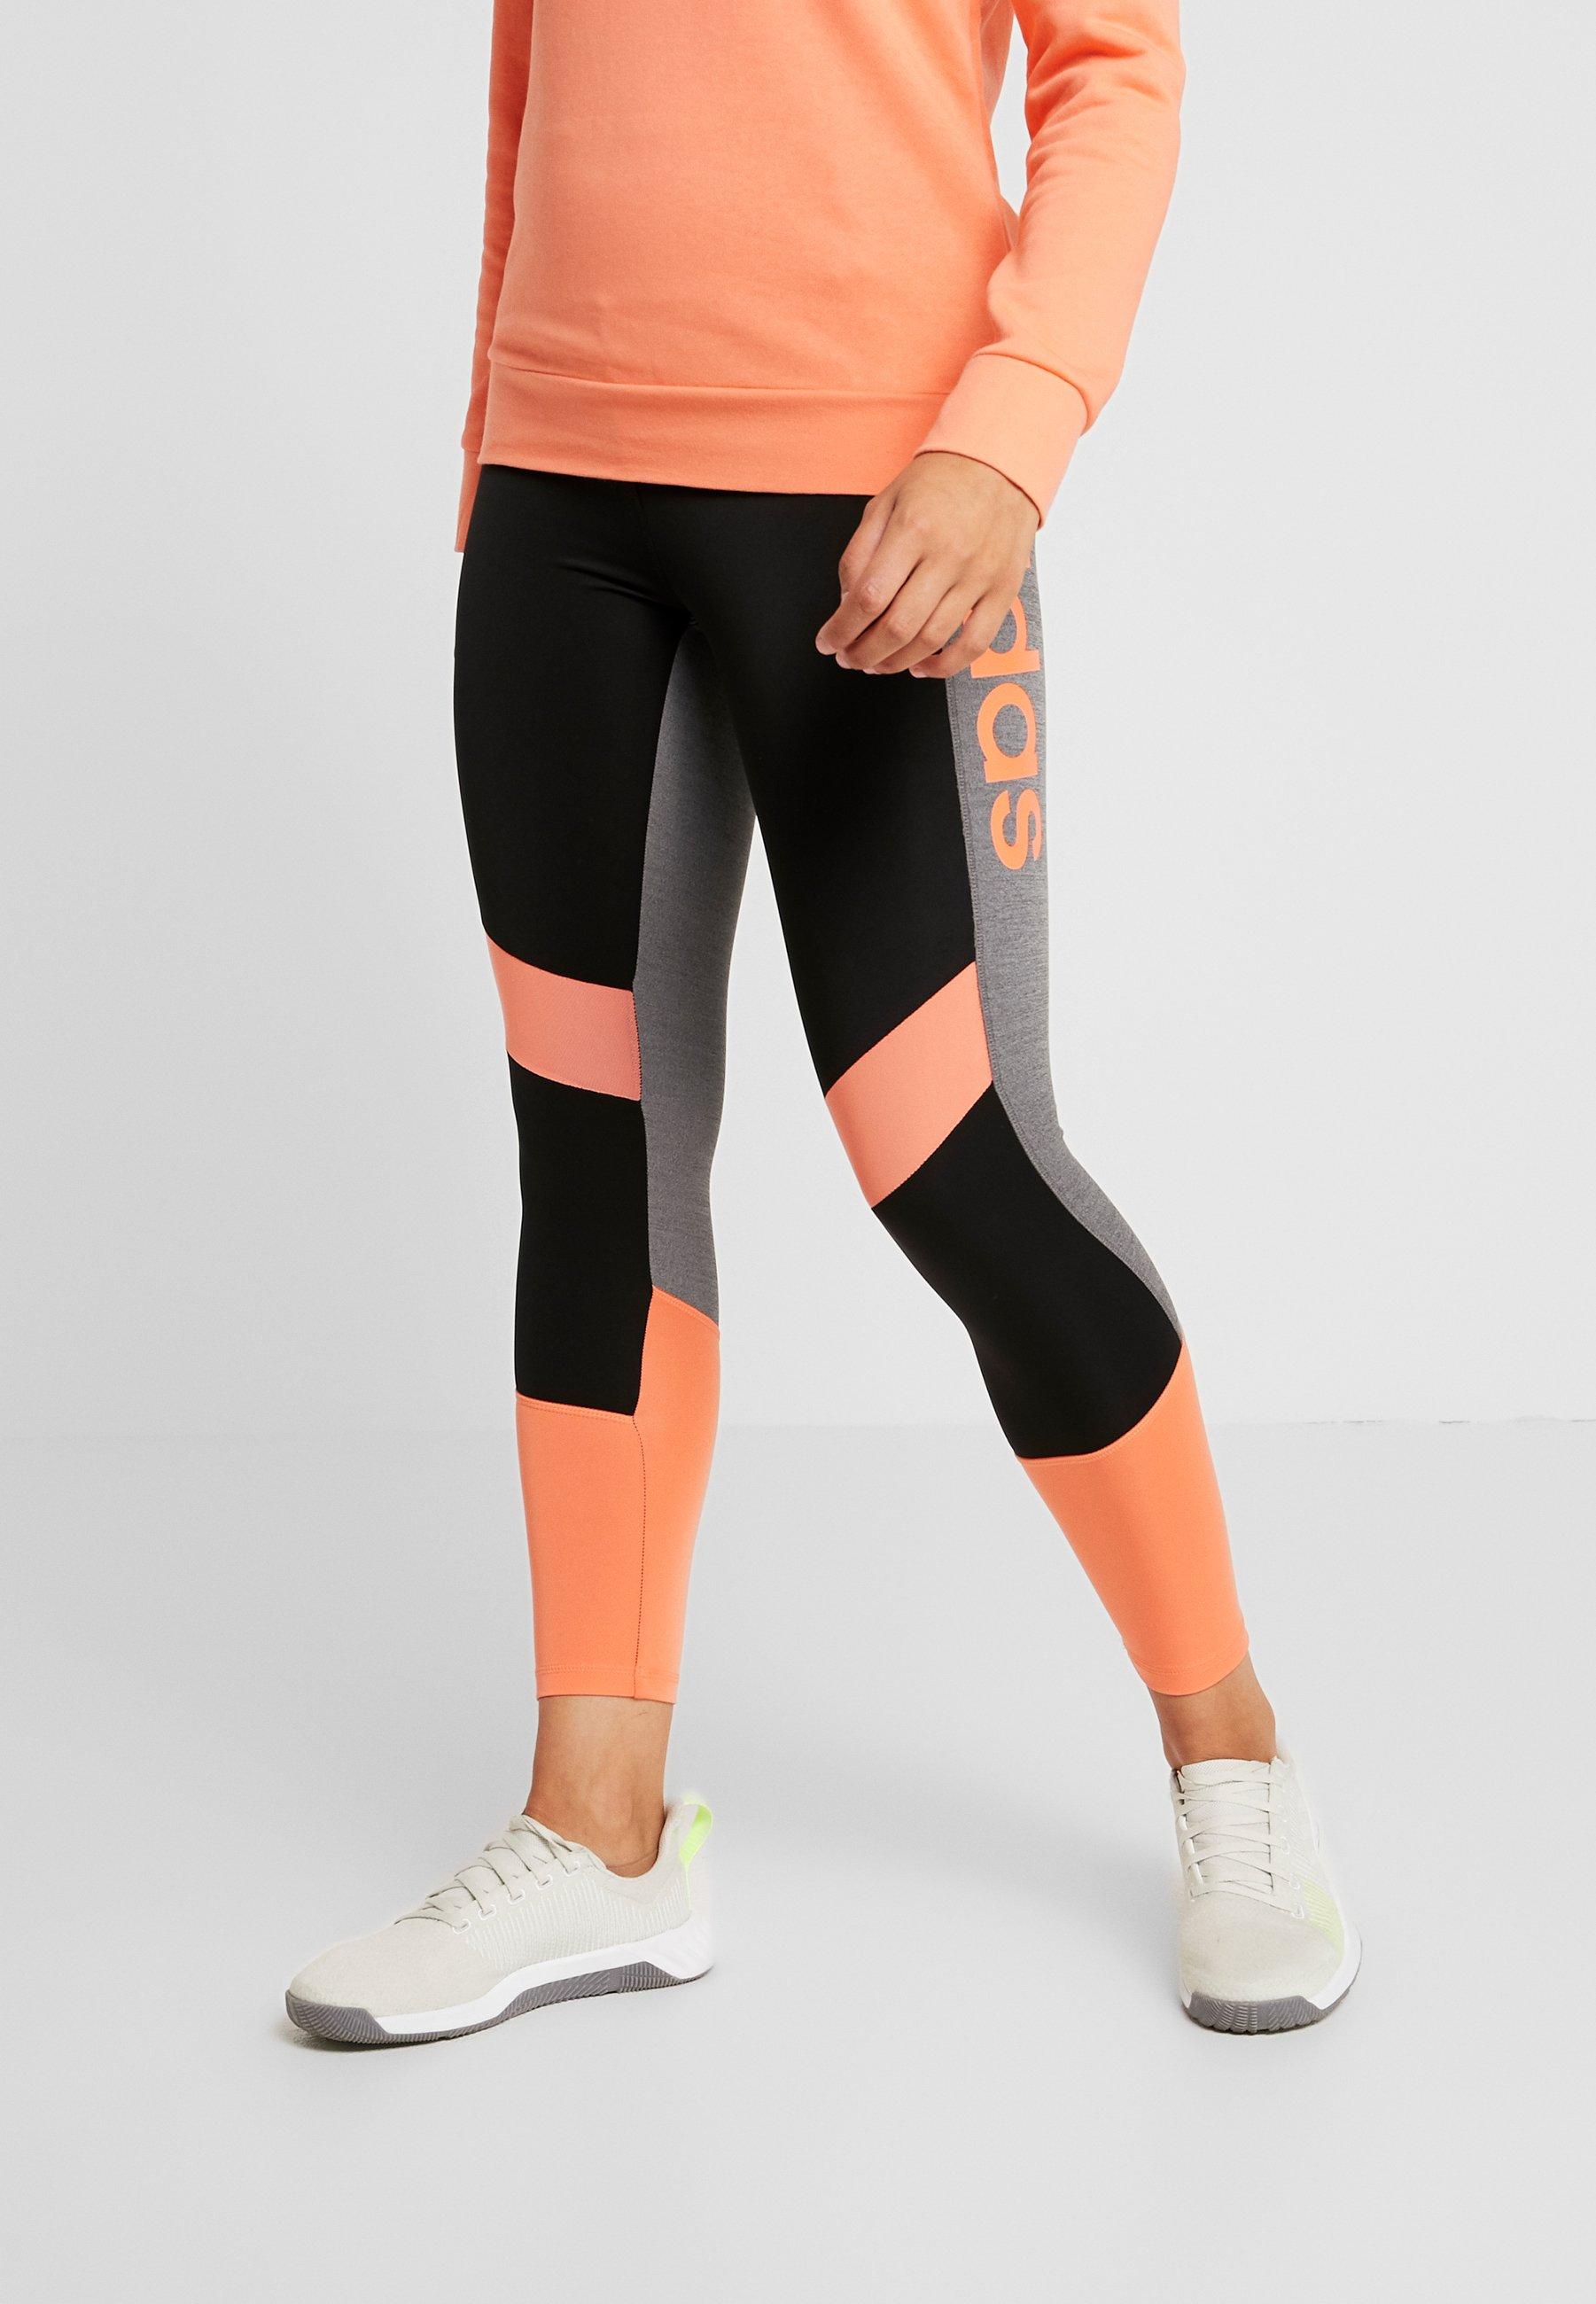 adidas Performance Collants black/semi coral